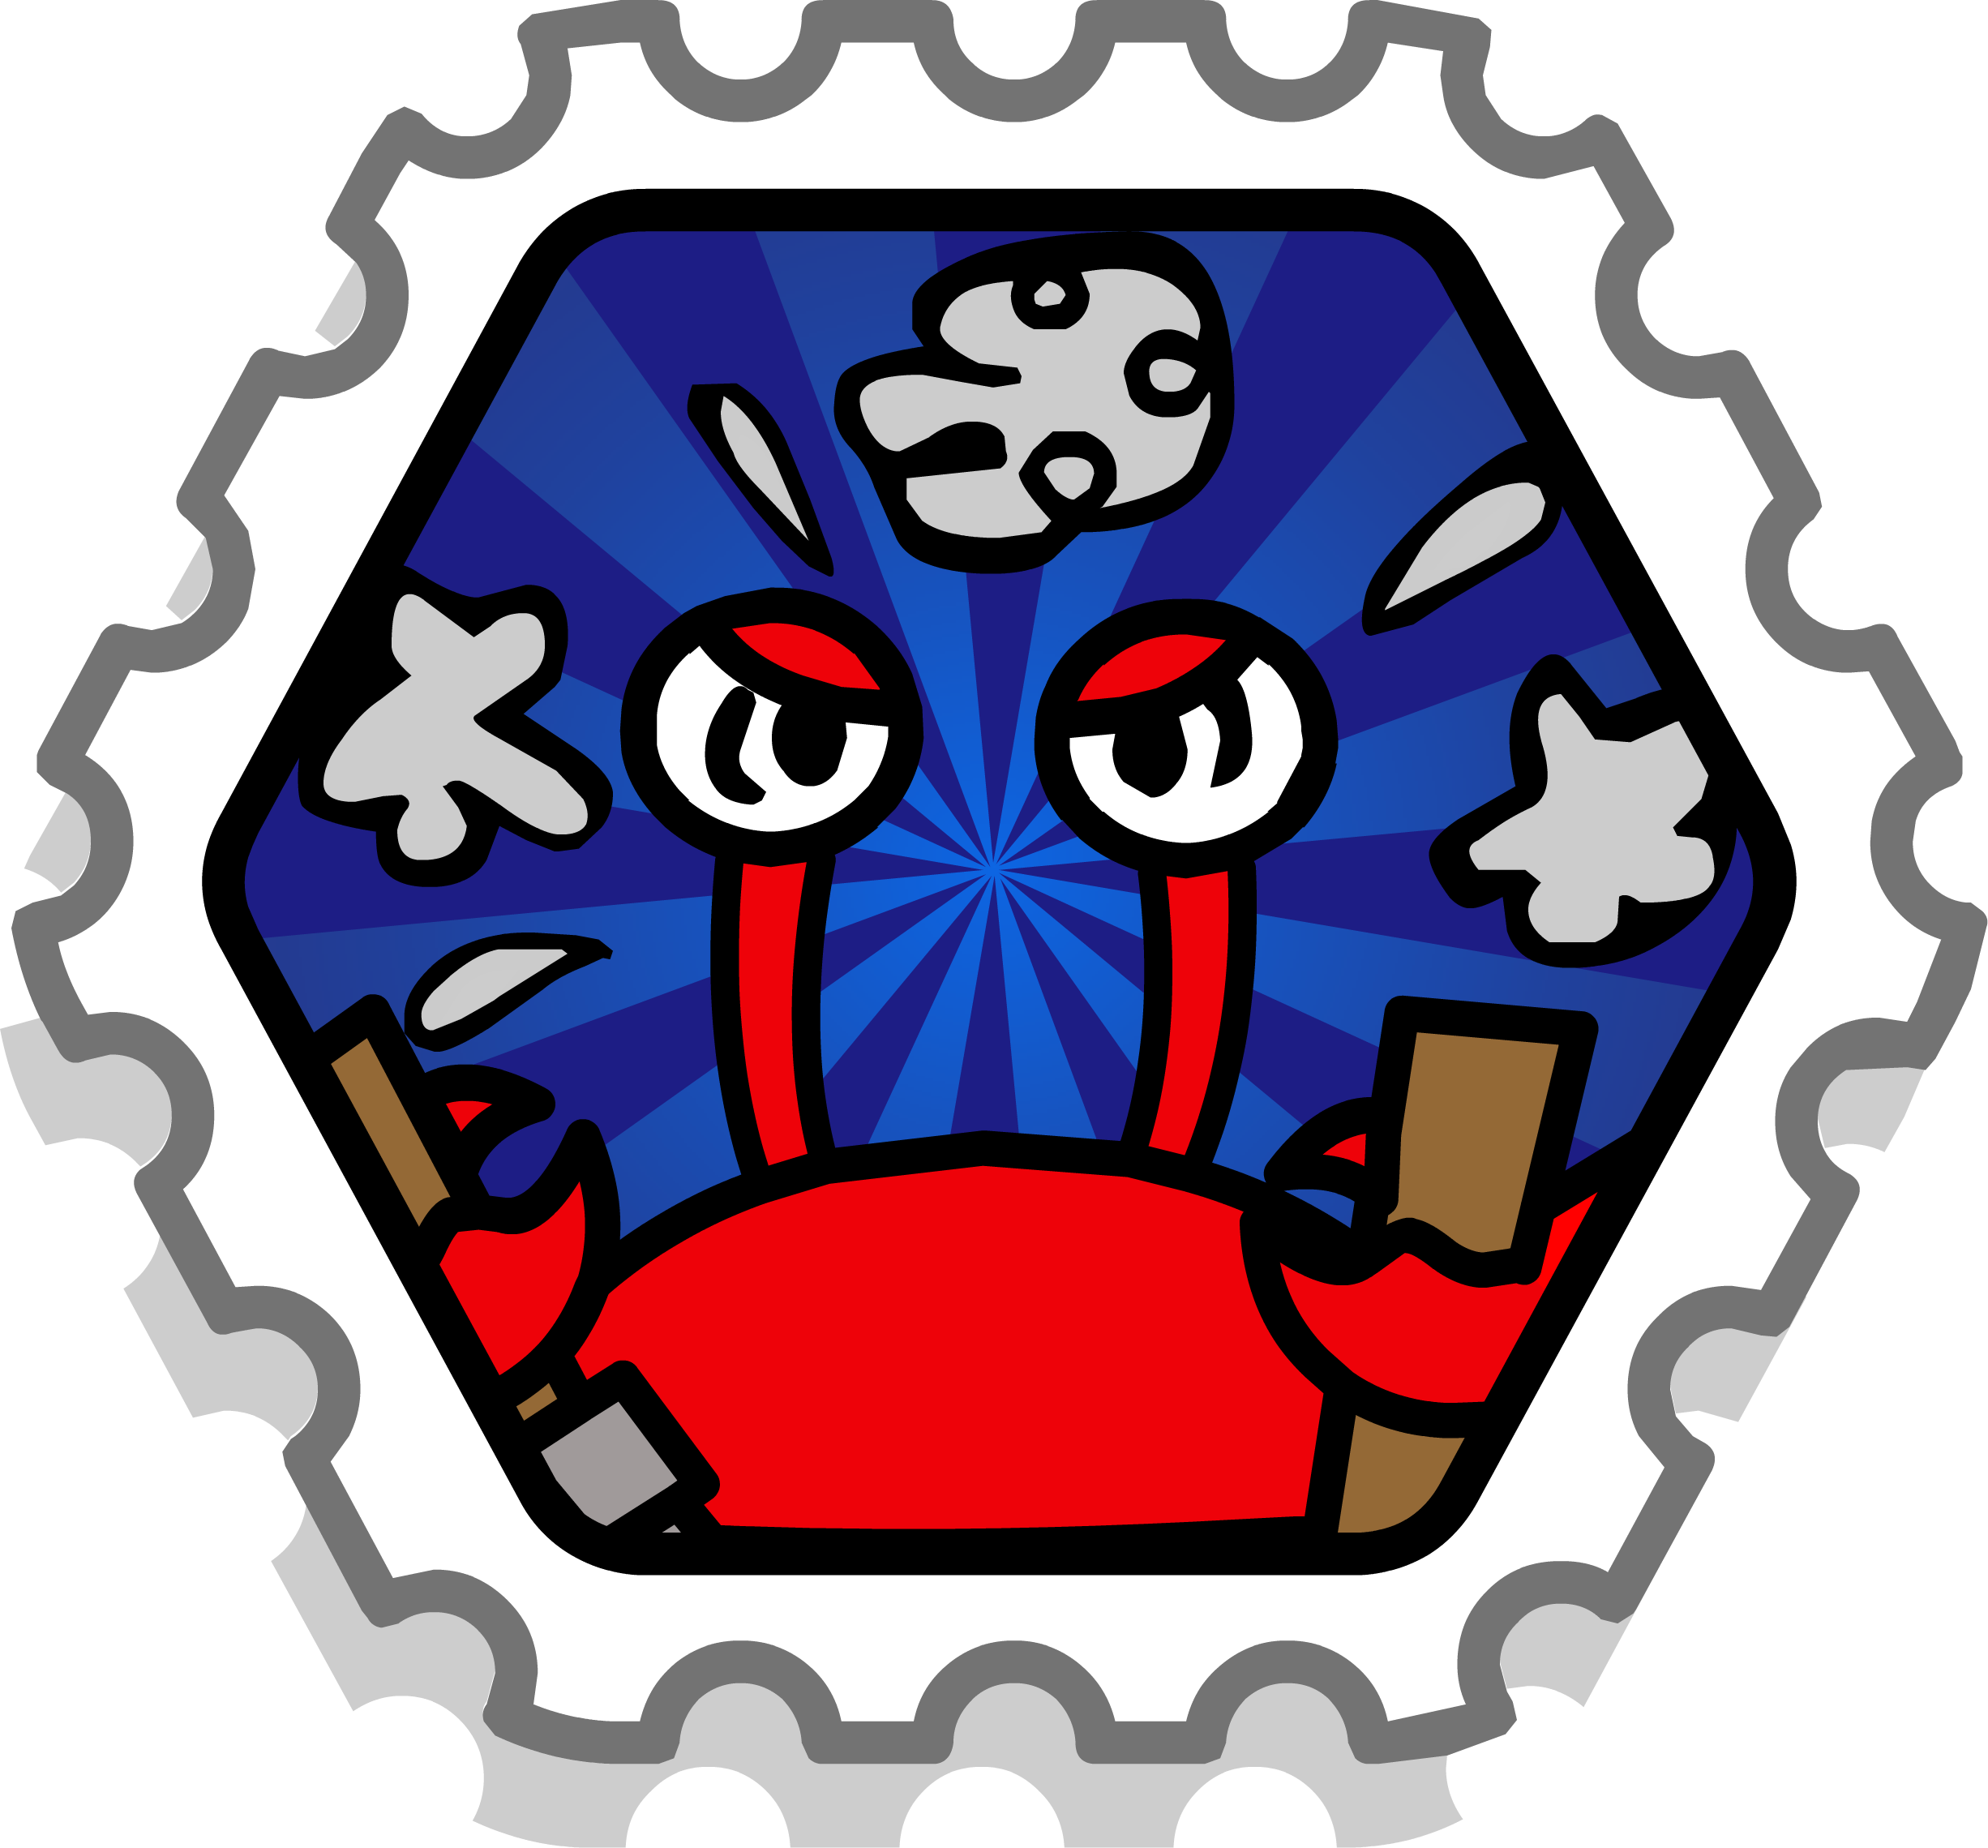 Crab Crash stamp